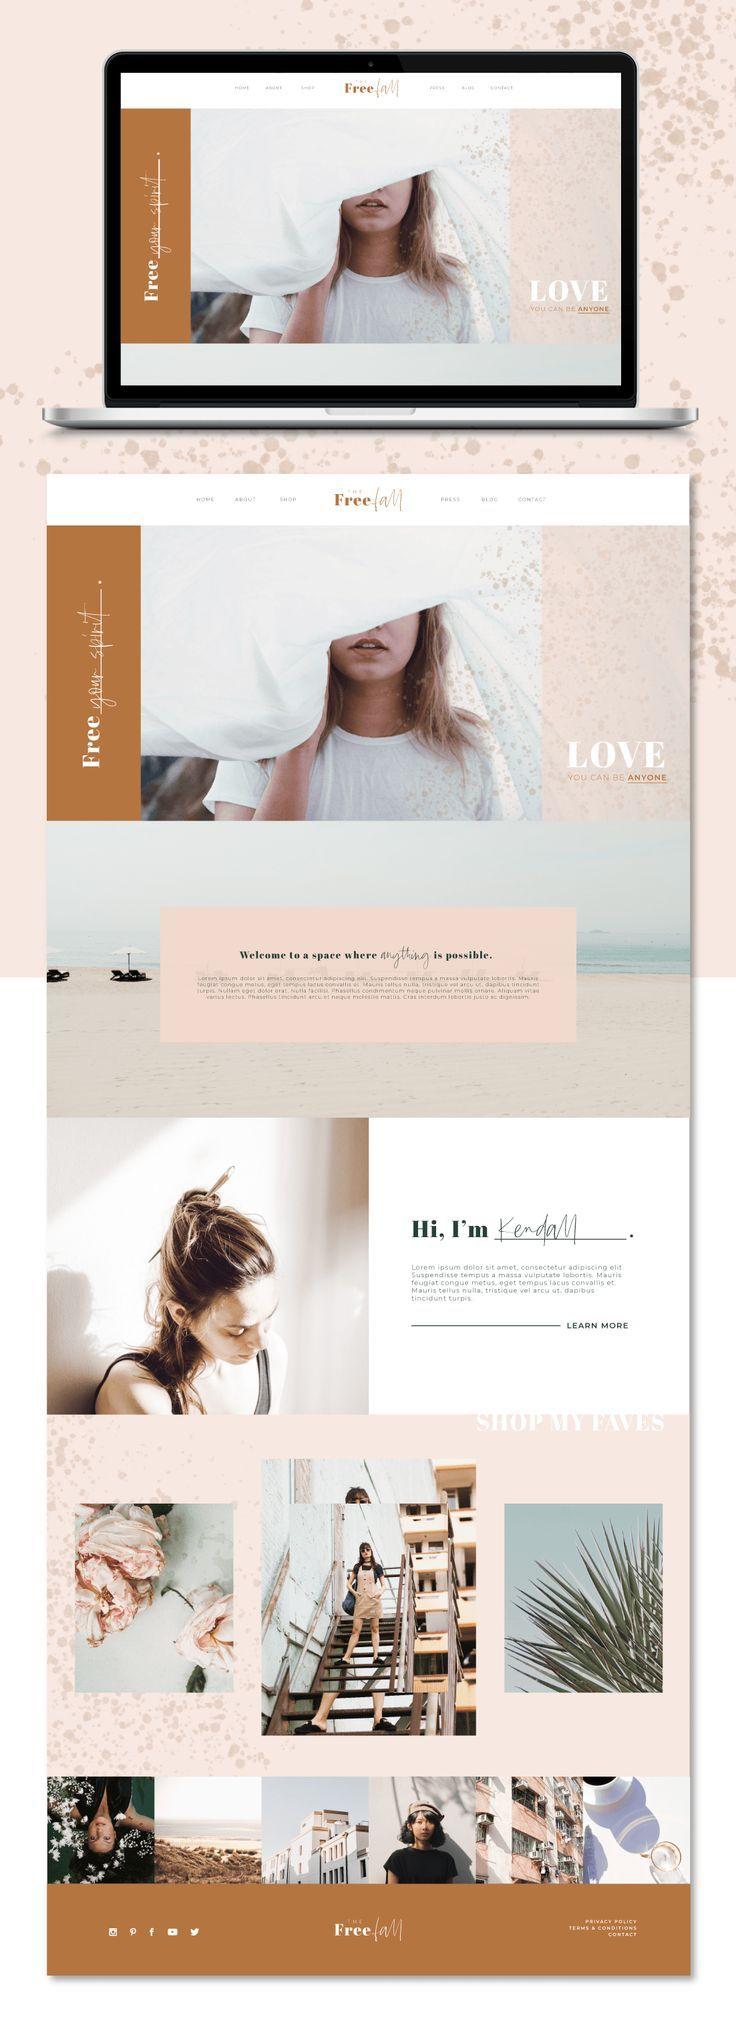 Minimal website design, minimal blog design, customizable blog template, customizable website template, neutral color palette, minimal branding #webdesign #wordpresstemplate